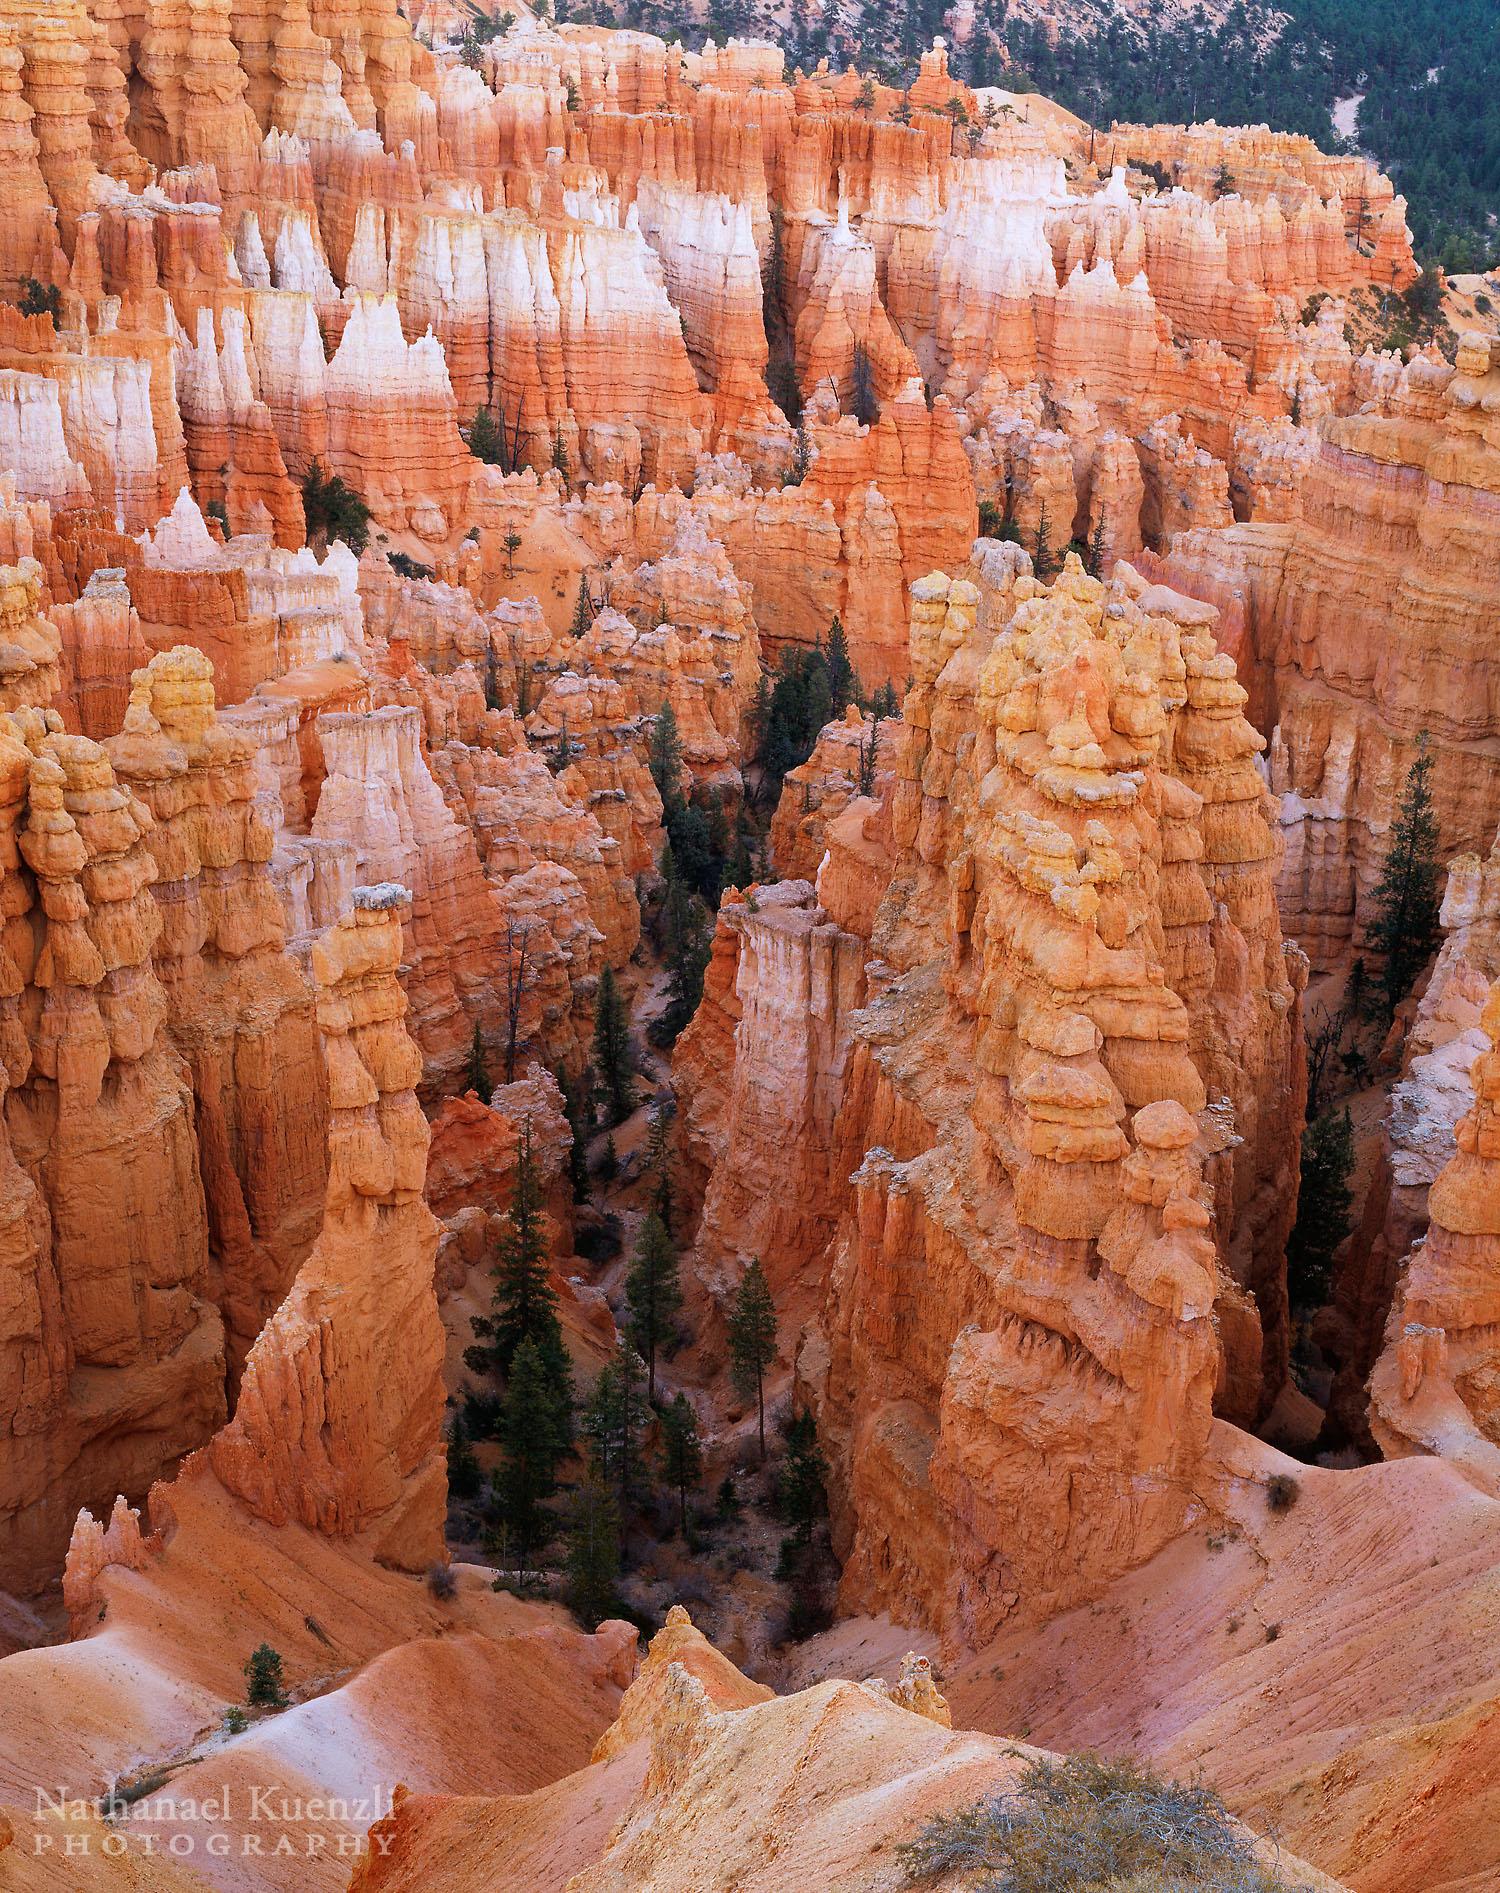 Bryce Canyon National Park, Utah, October 2003